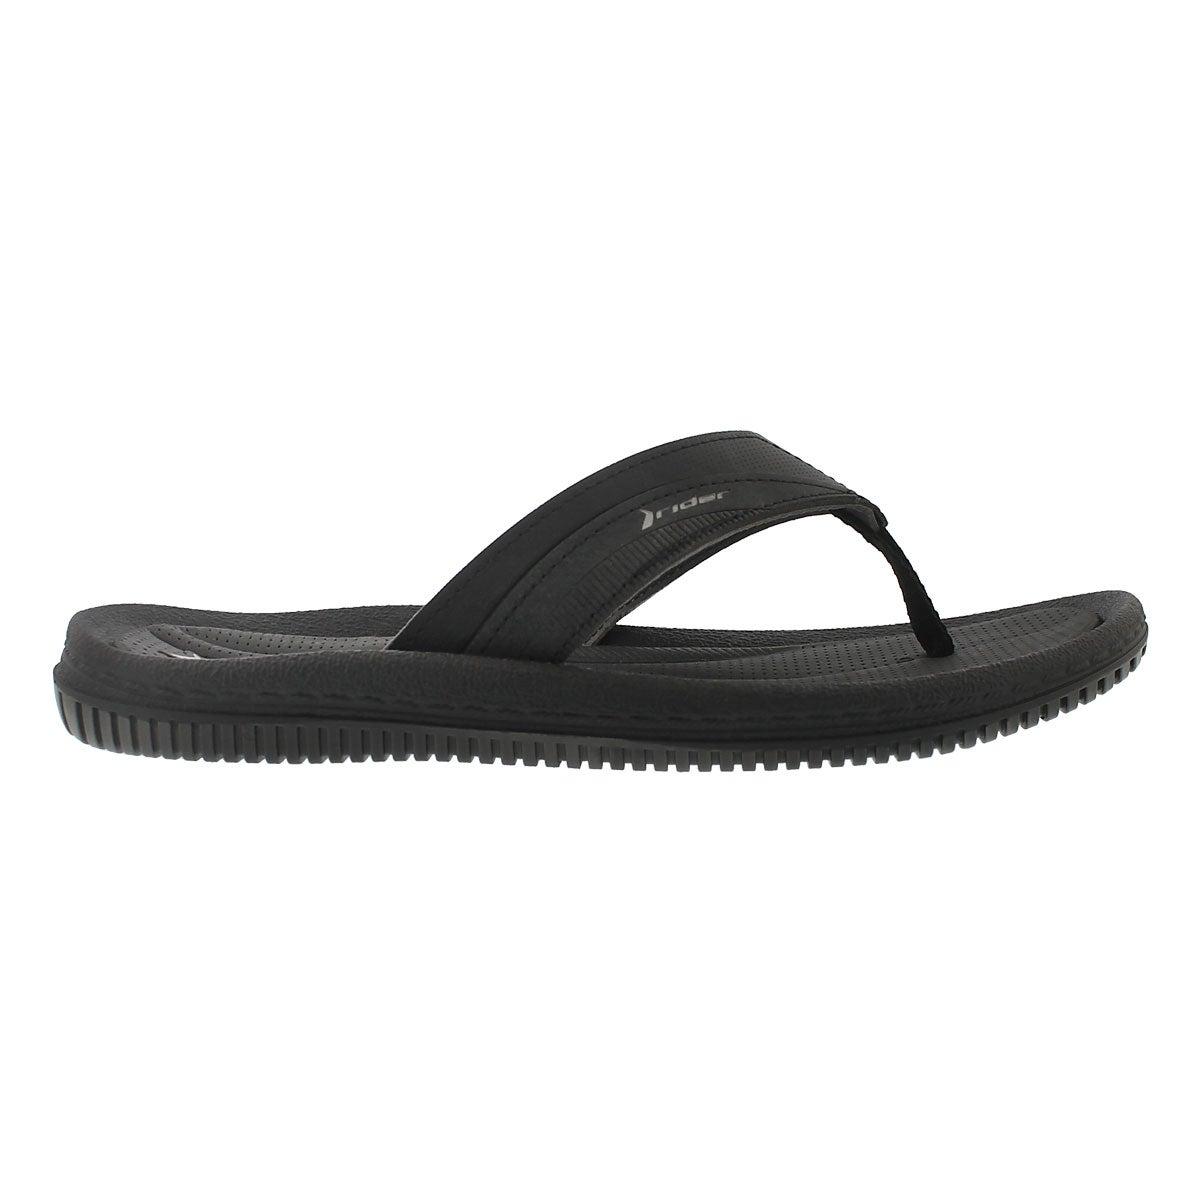 Mns Dunas XI black/grey flip flop